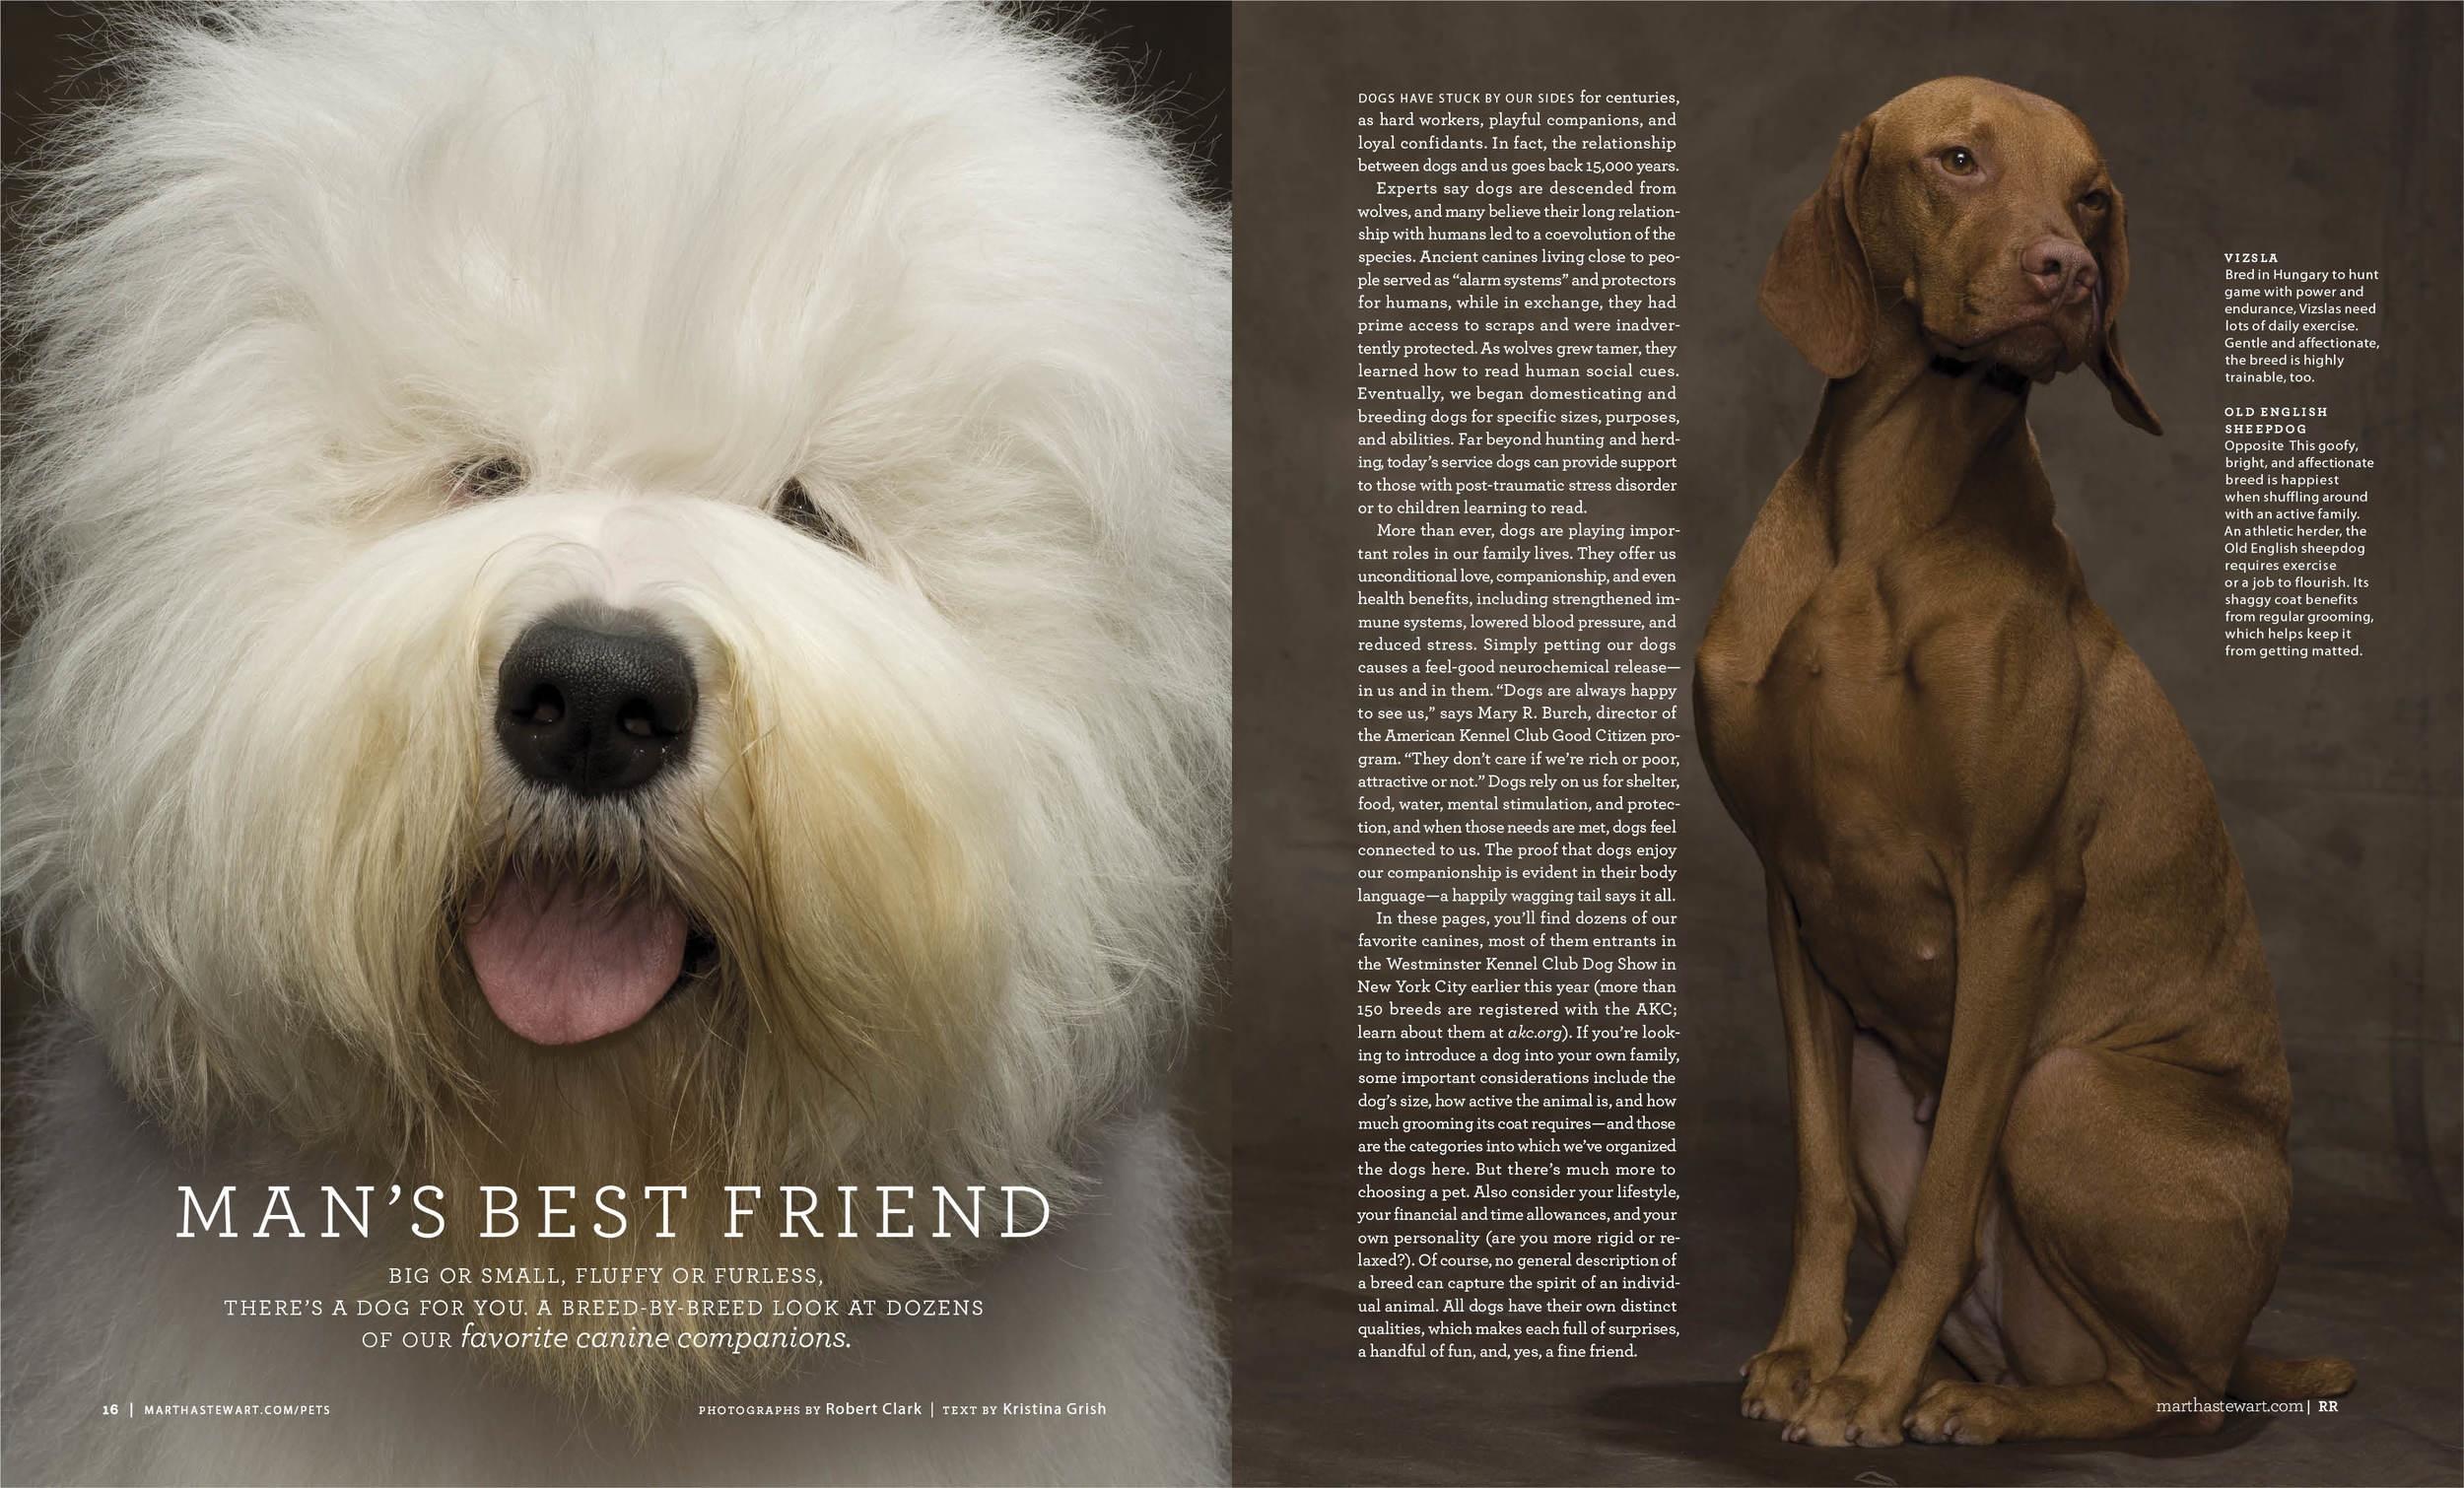 16-17 Man's Best Friend MSL1011-16P copy.jpg